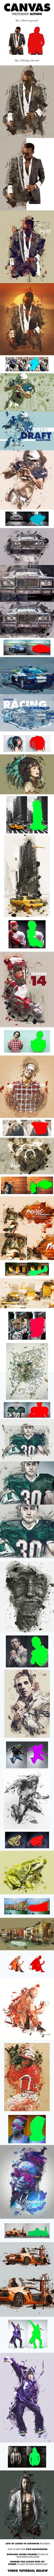 Canvas Photoshop Action | GraphicRiver